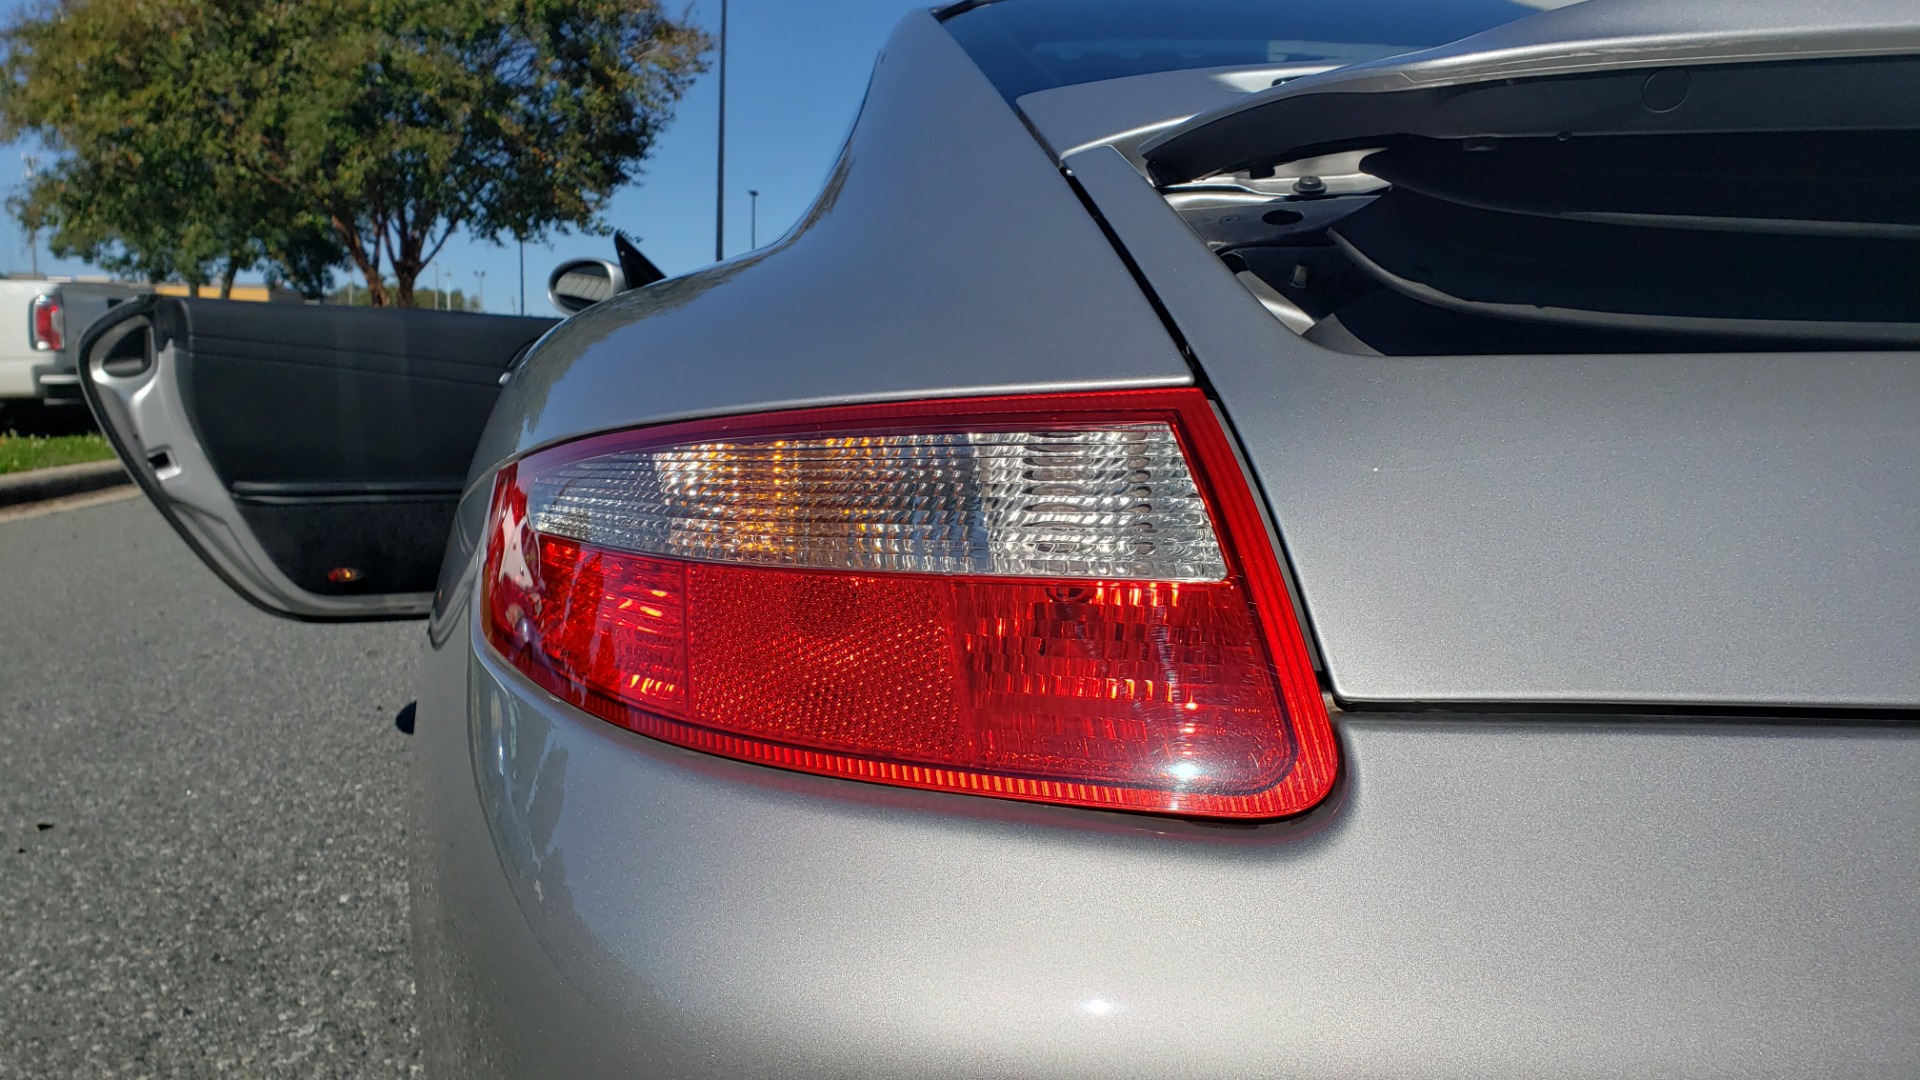 Used 2006 Porsche 911 CARRERA S / 5-SPD AUTO / SPORT CHRONO / NAV / BOSE / SUNROOF for sale Sold at Formula Imports in Charlotte NC 28227 21